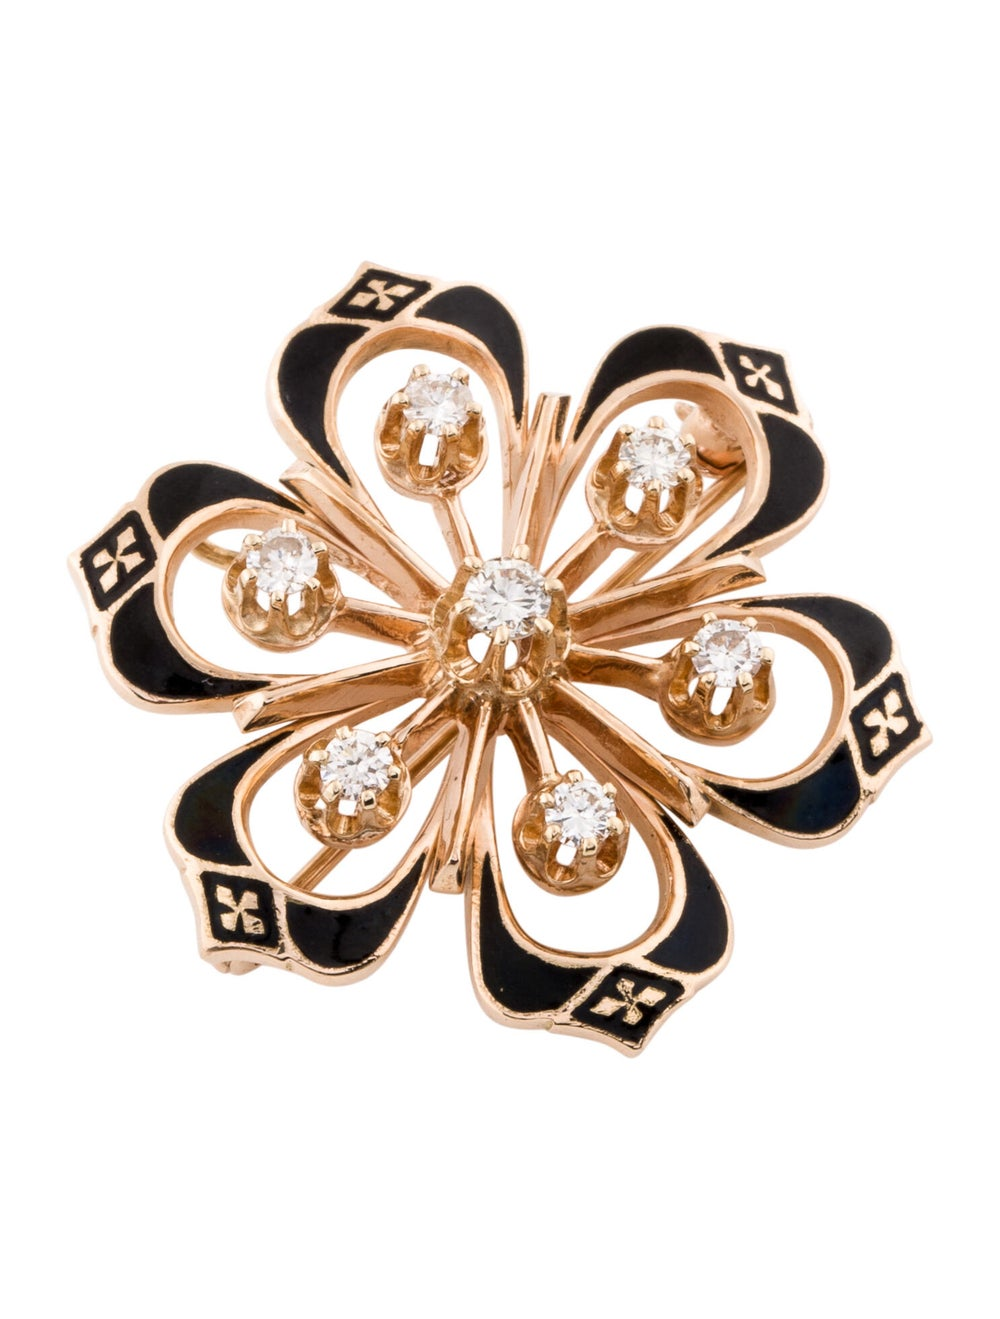 14K Diamond Pendant Brooch rose - image 3